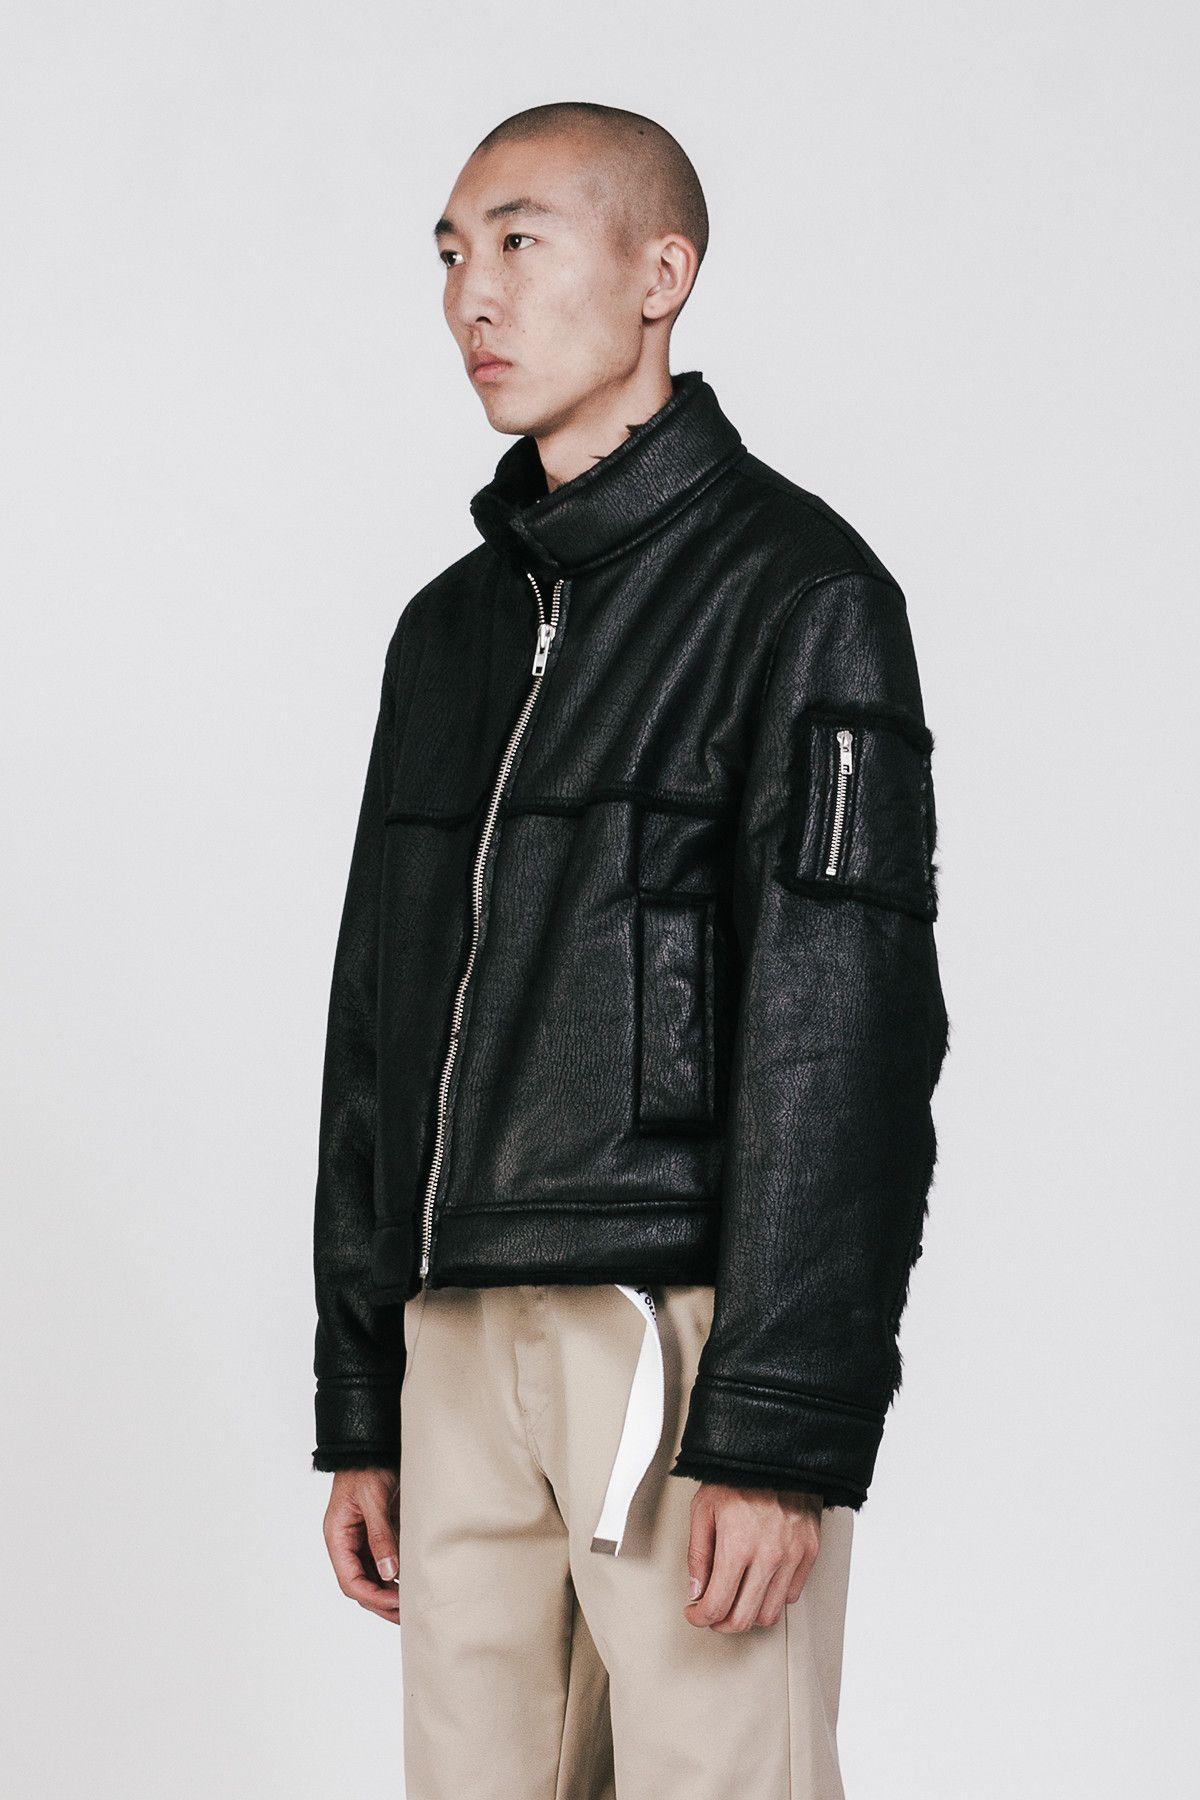 Gosha Sheepskin Short Coat Black | Jackets | Pinterest | Short ...